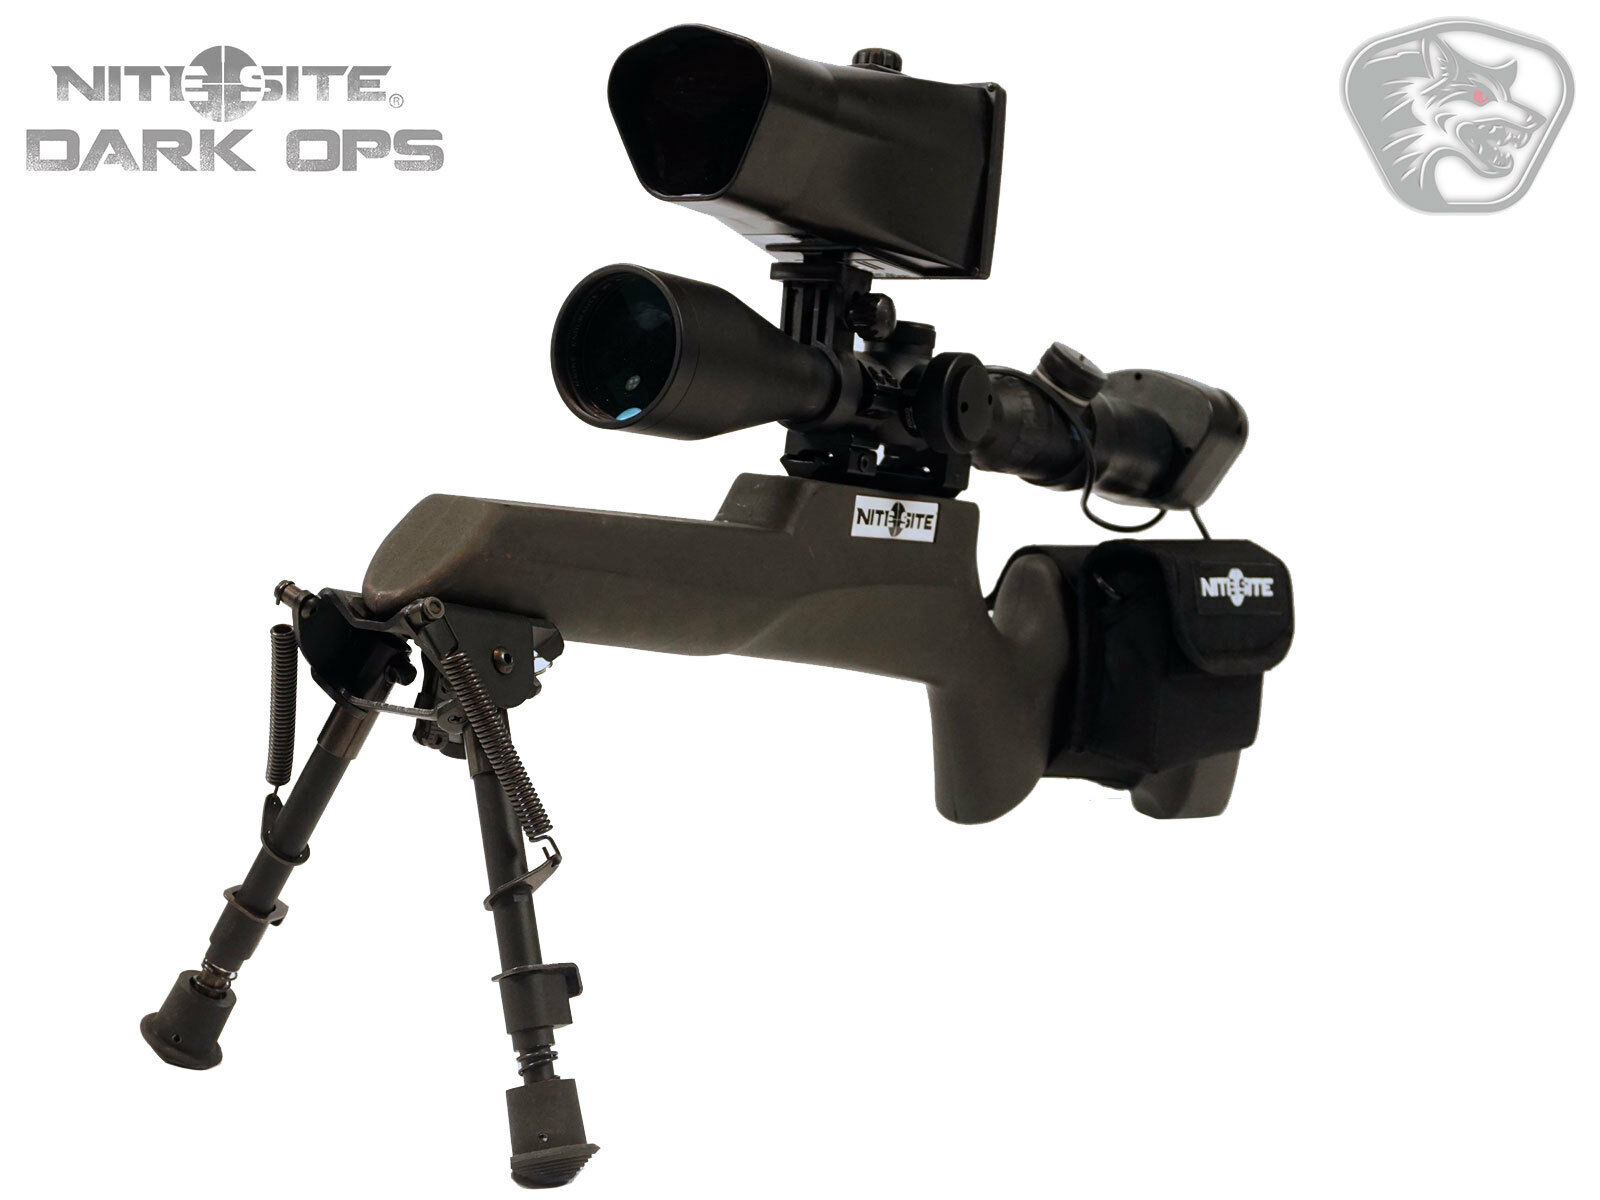 Nite Site Dark Ops WOLF - Complete Night Vision Conversion Kit - Free UK Postage